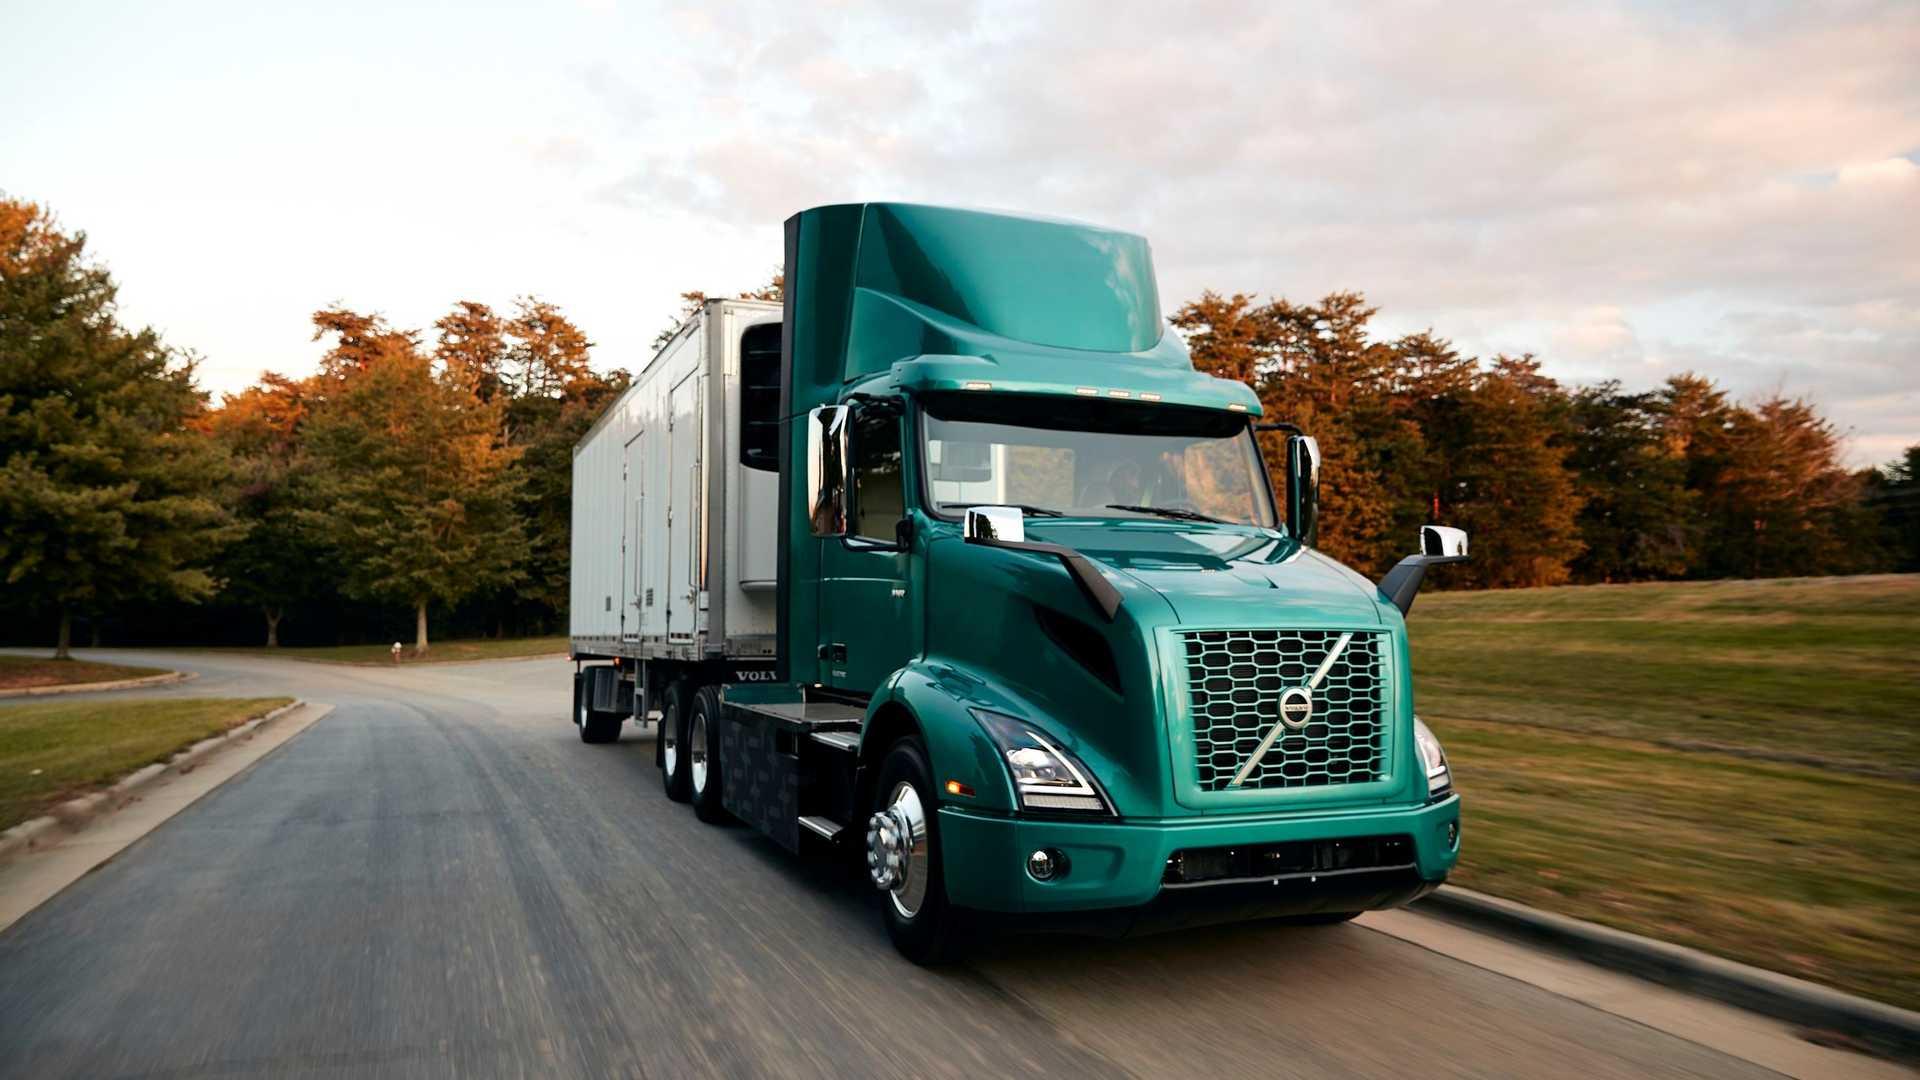 volvo vnr electric 2 اولین کامیون تمام برقی Volvo Trucks معرفی شد اخبار IT